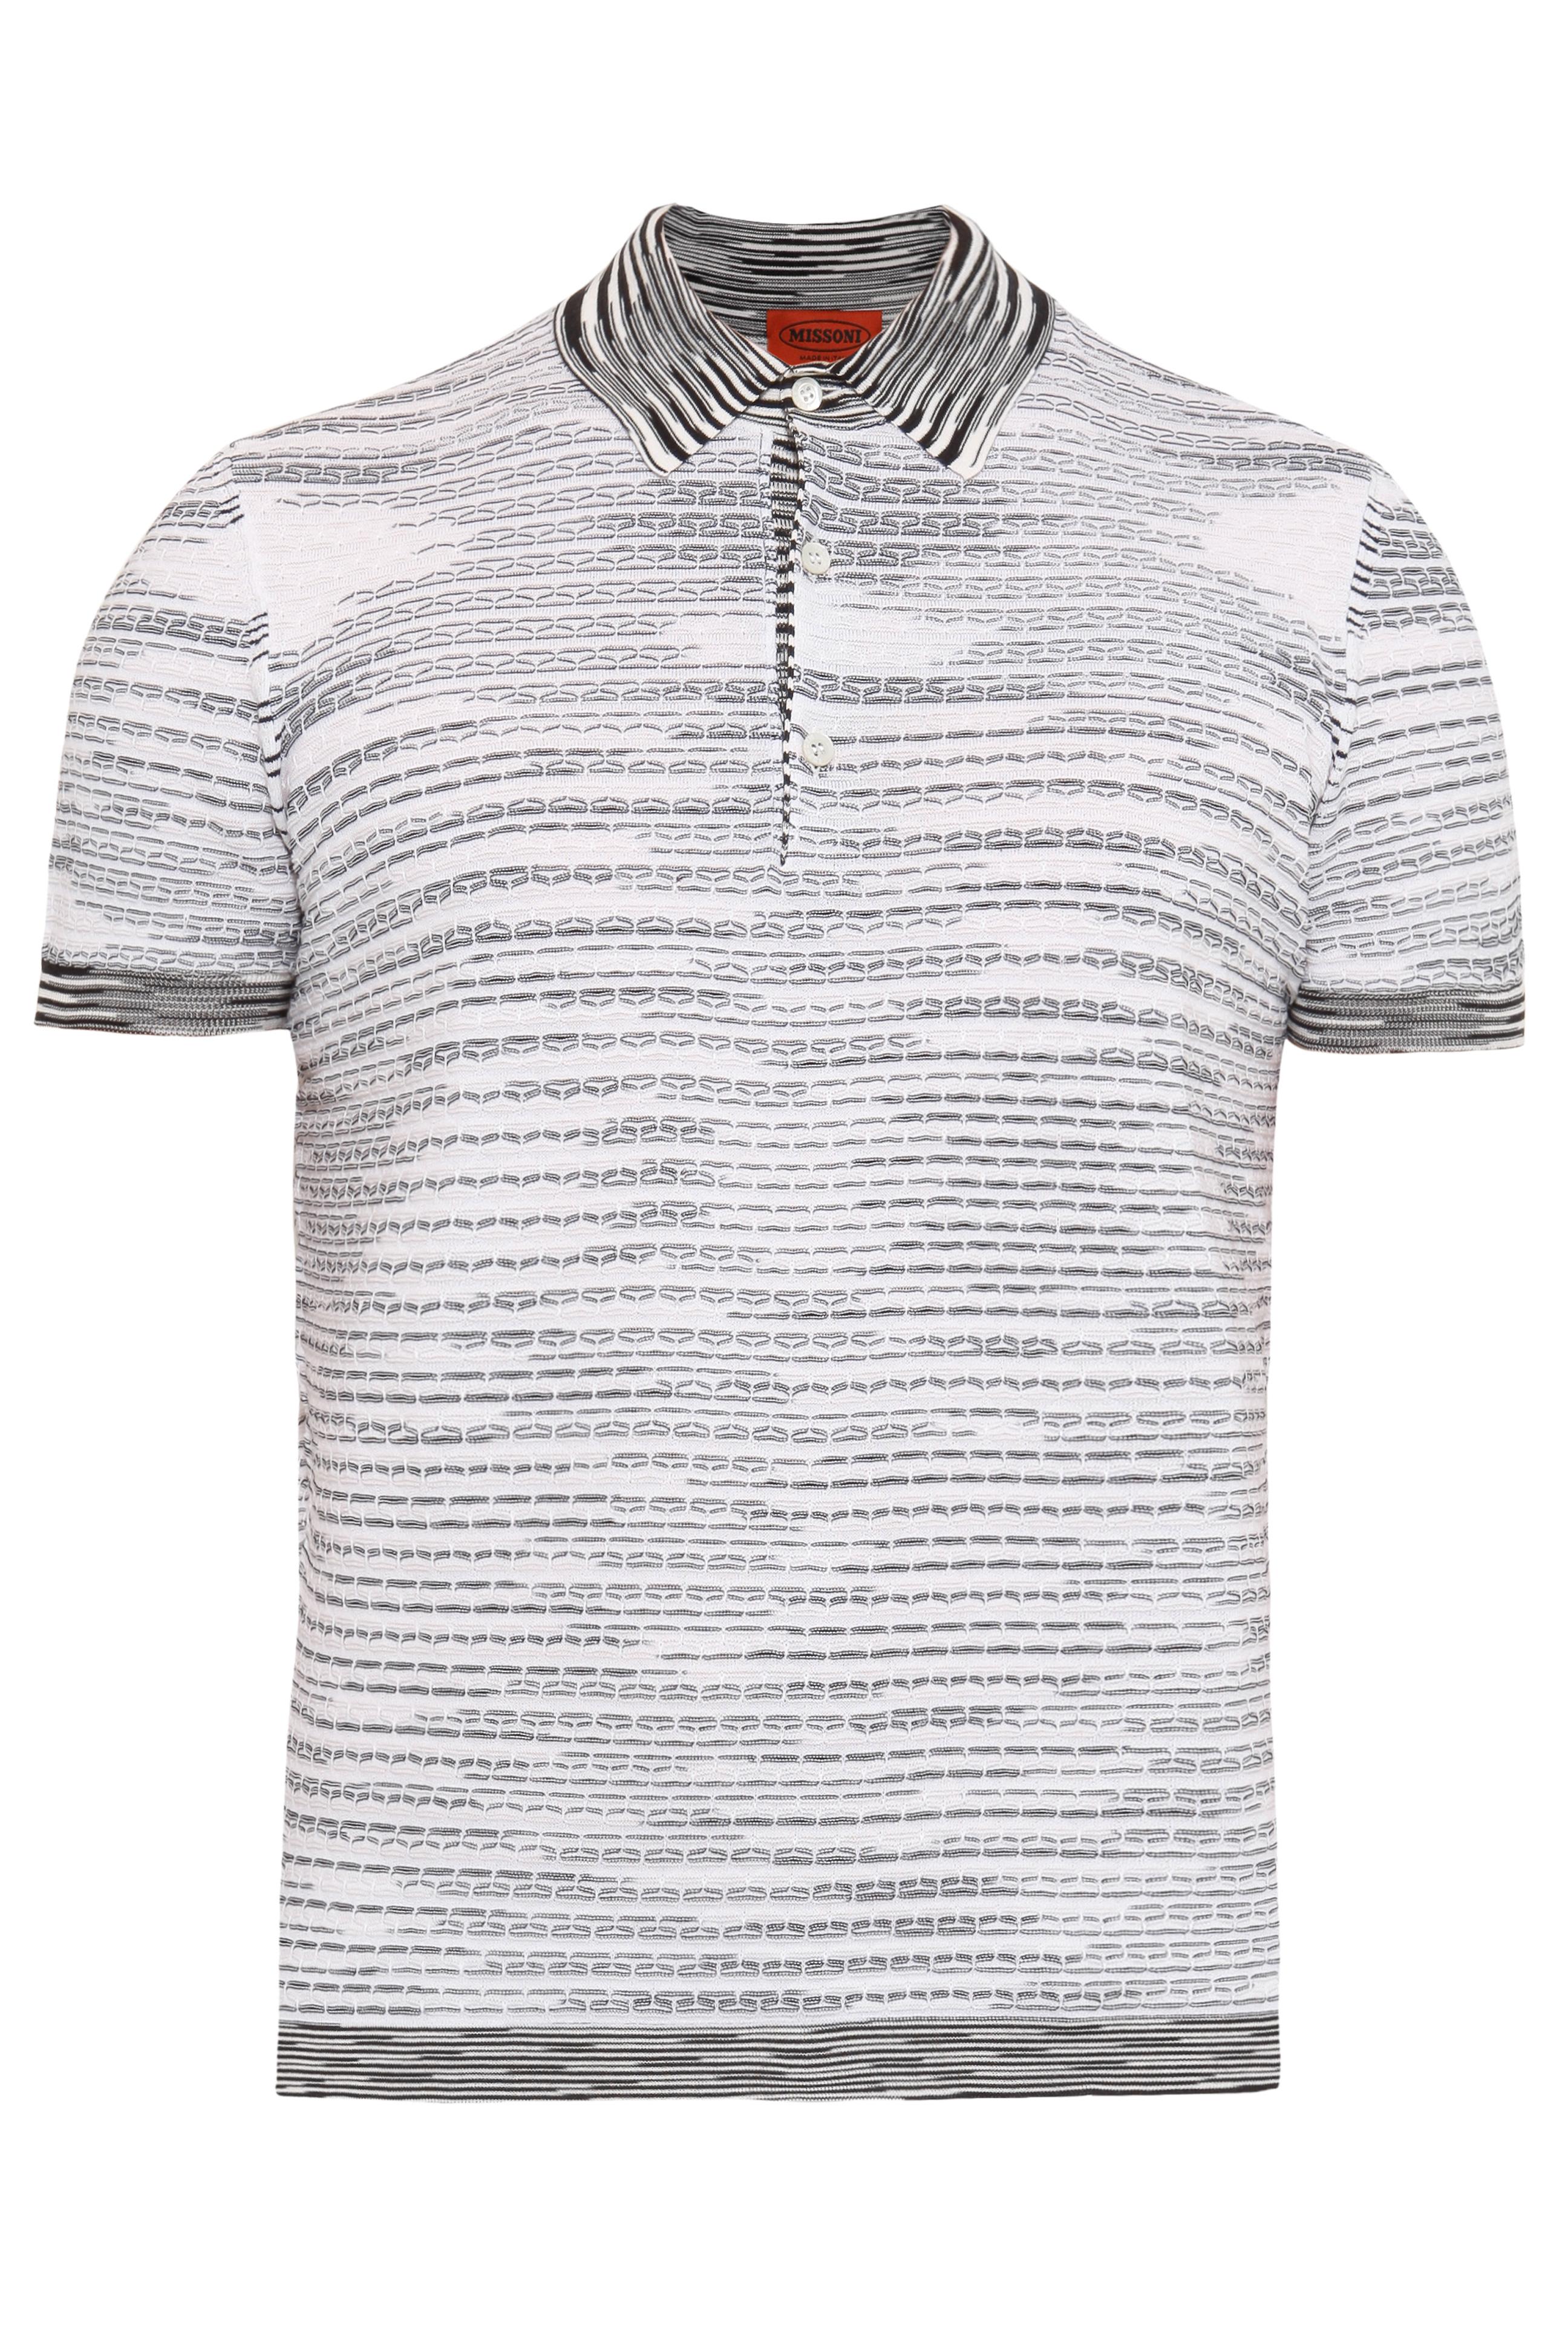 3de204001cfb26 Missoni Exclusive Patterned Cotton Polo Shirt in Black for Men - Lyst